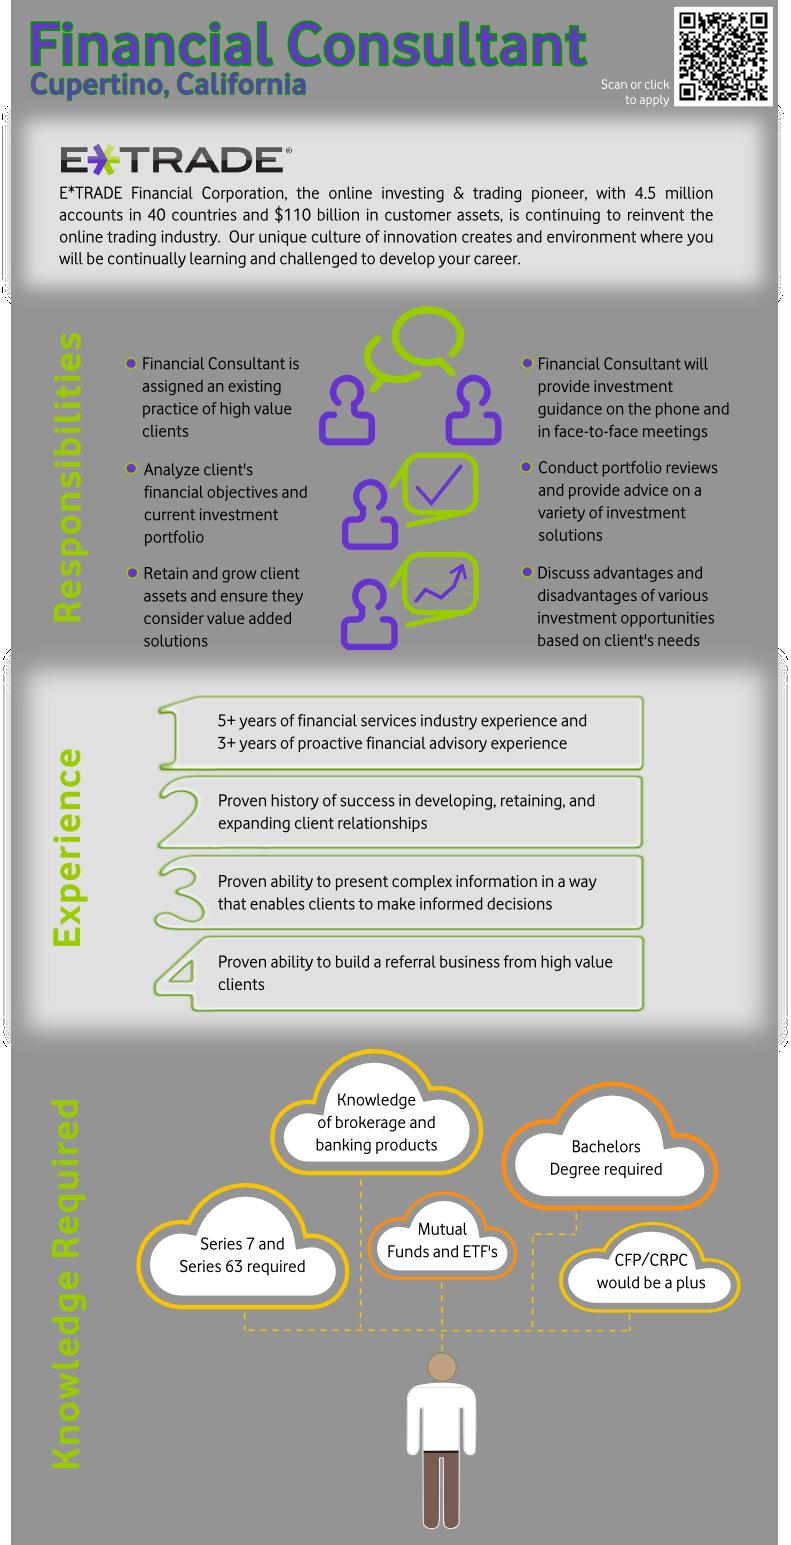 E Trade Financial Consultant Cupertino Ca Office Infographic Job Description To View Full Job Description And Apply Https Job Ads E Trade Job Hunting